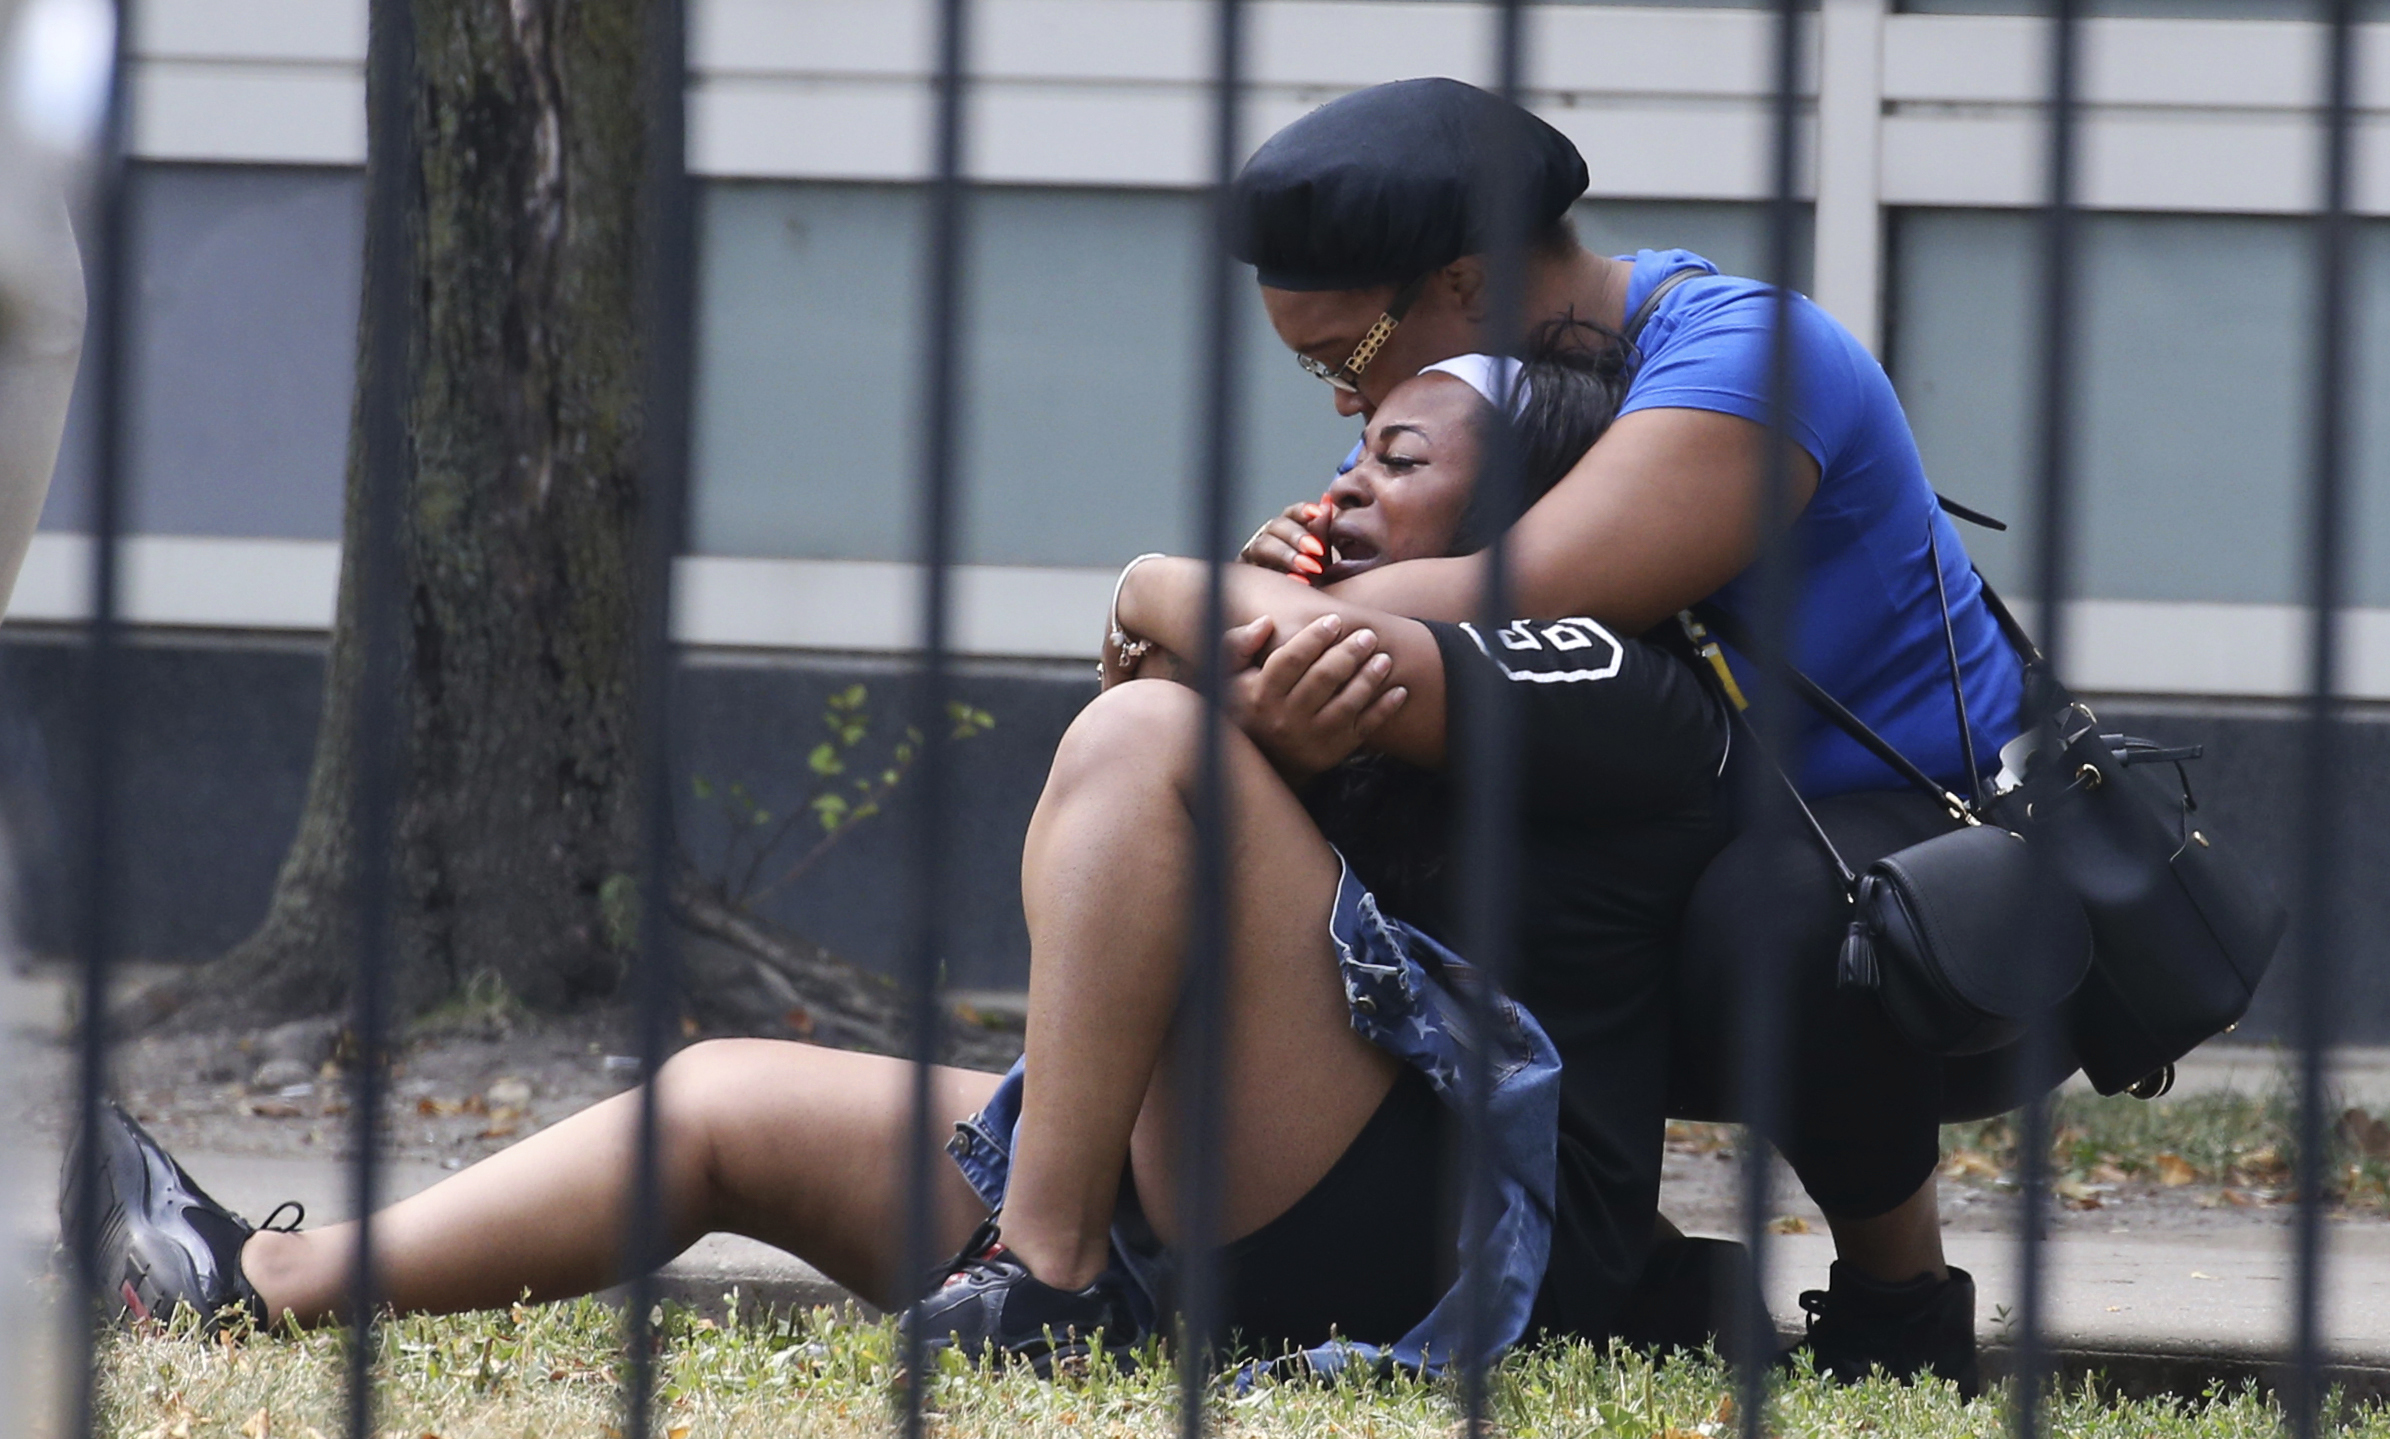 Chicago_Violence_42920-159532.jpg56821563